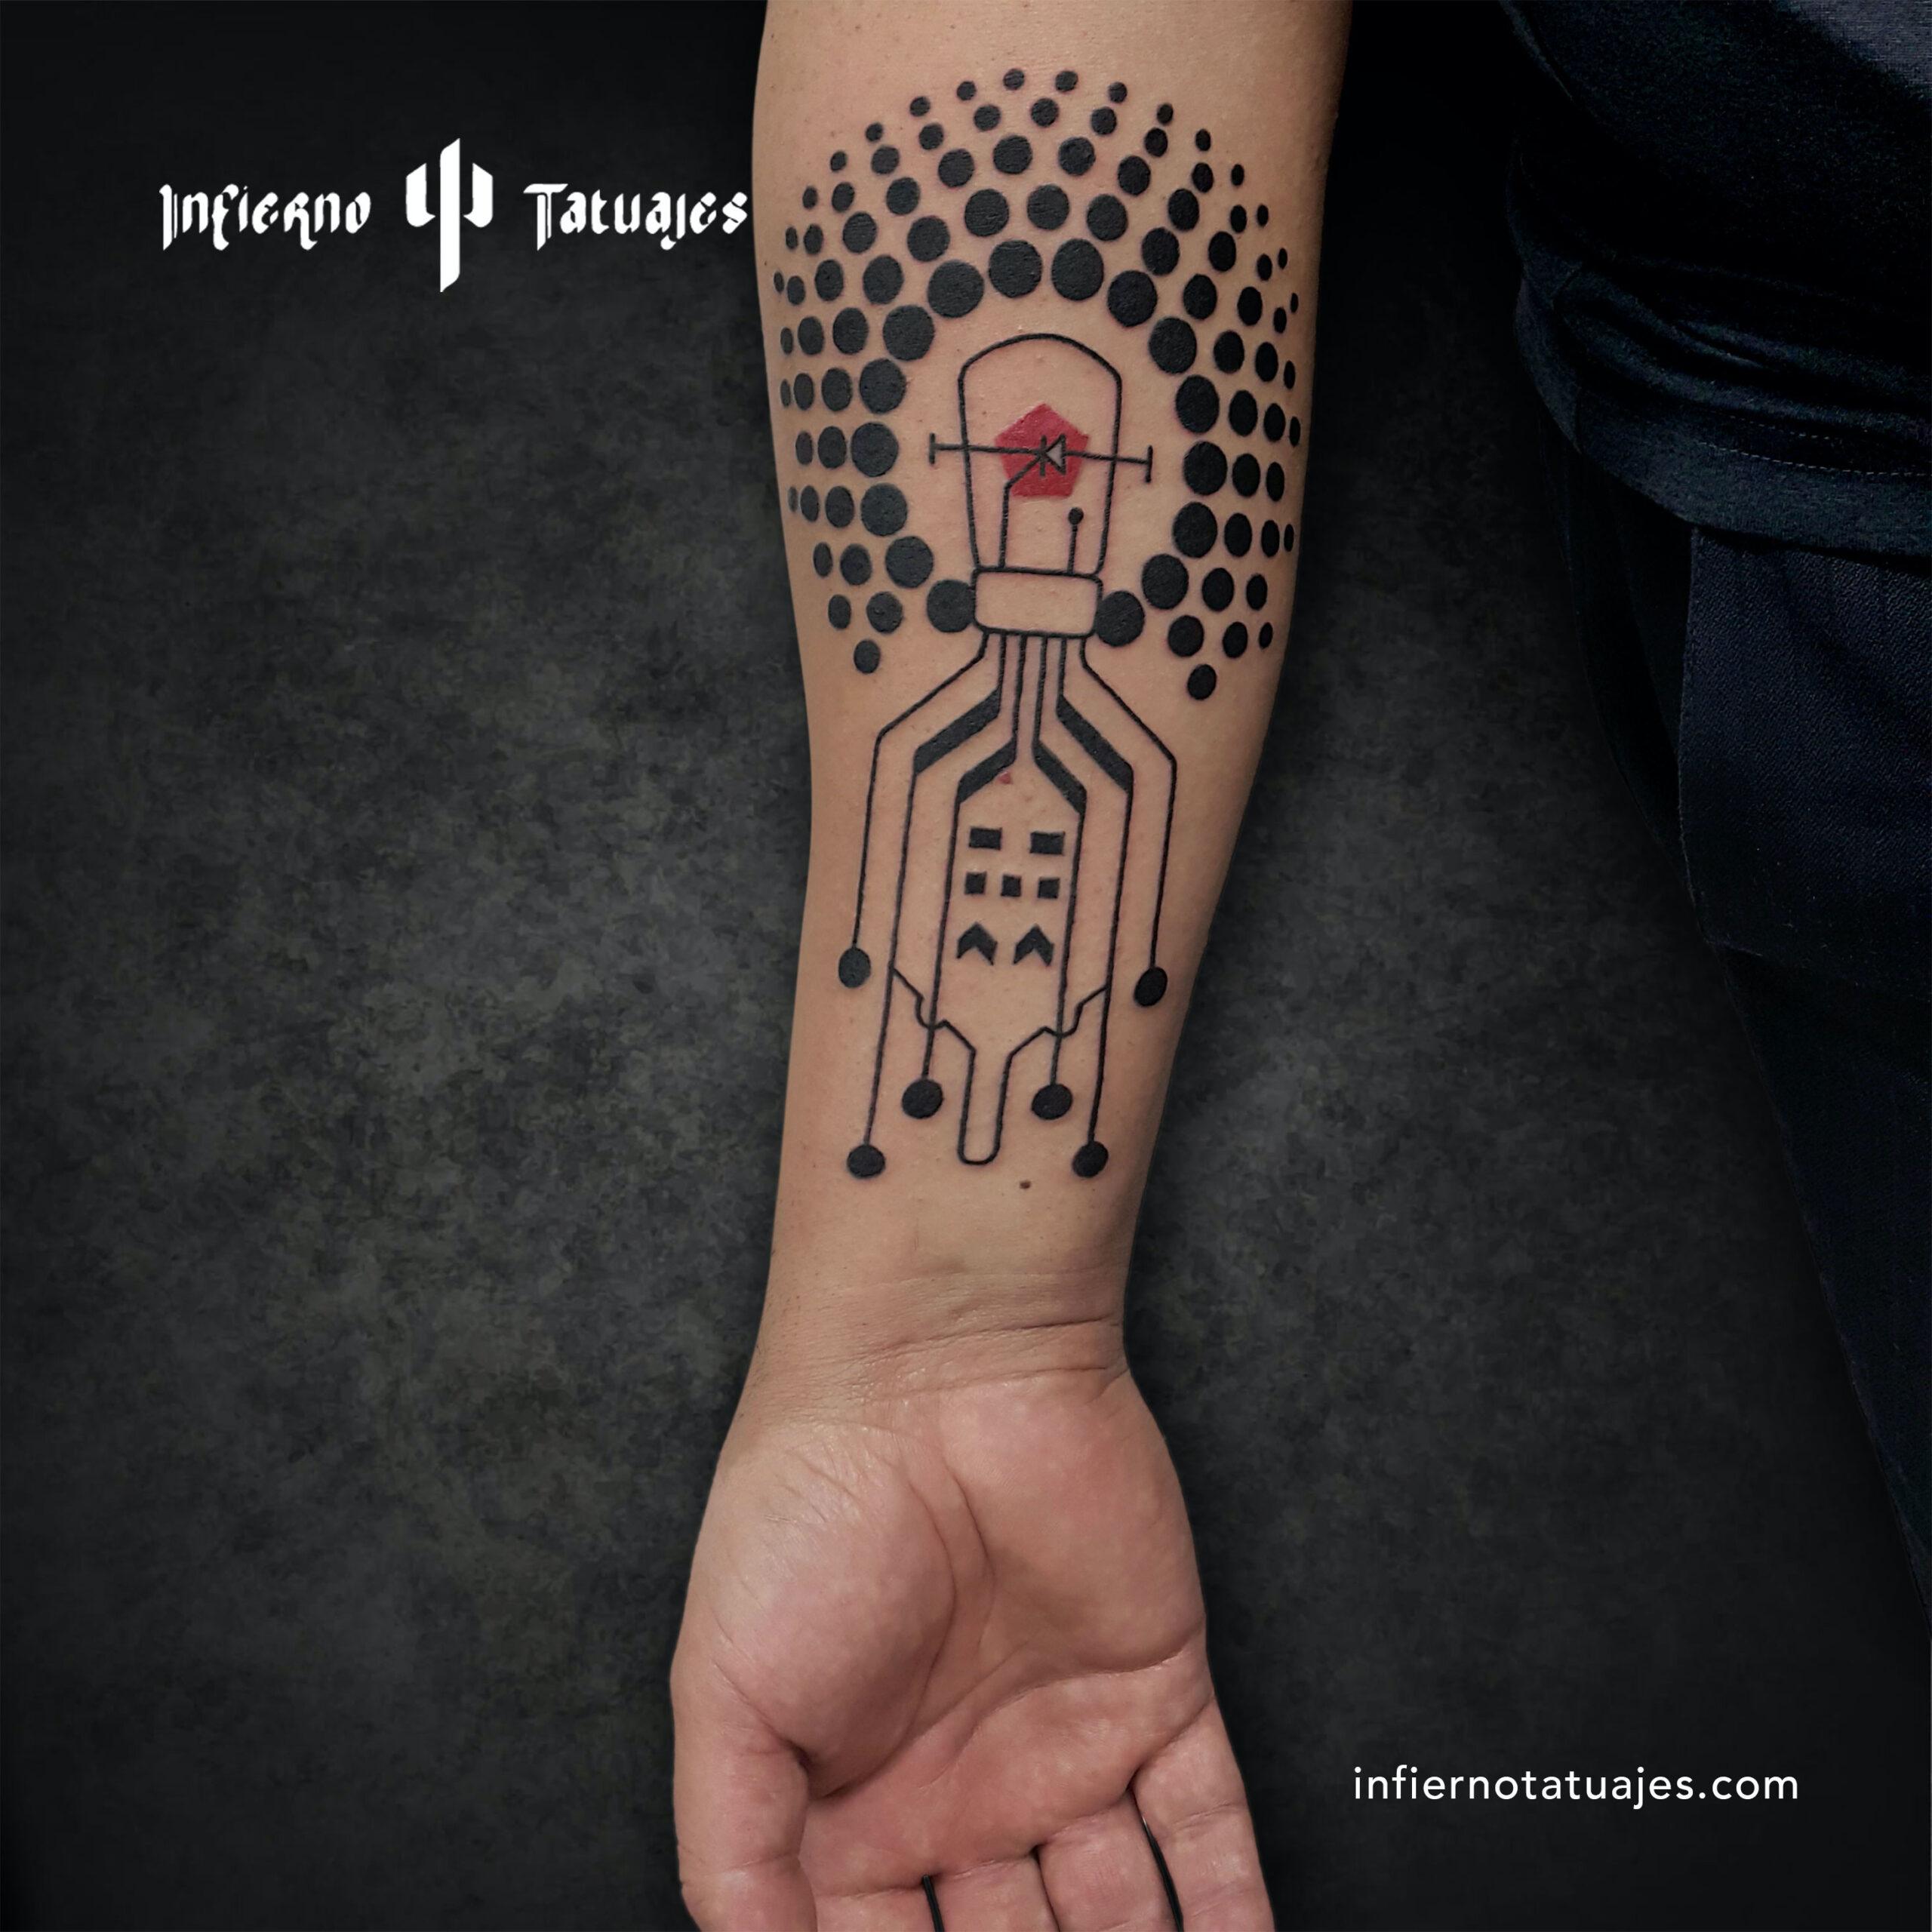 Bulbo – Creado por Javier Gaona | Infierno Tatuajes